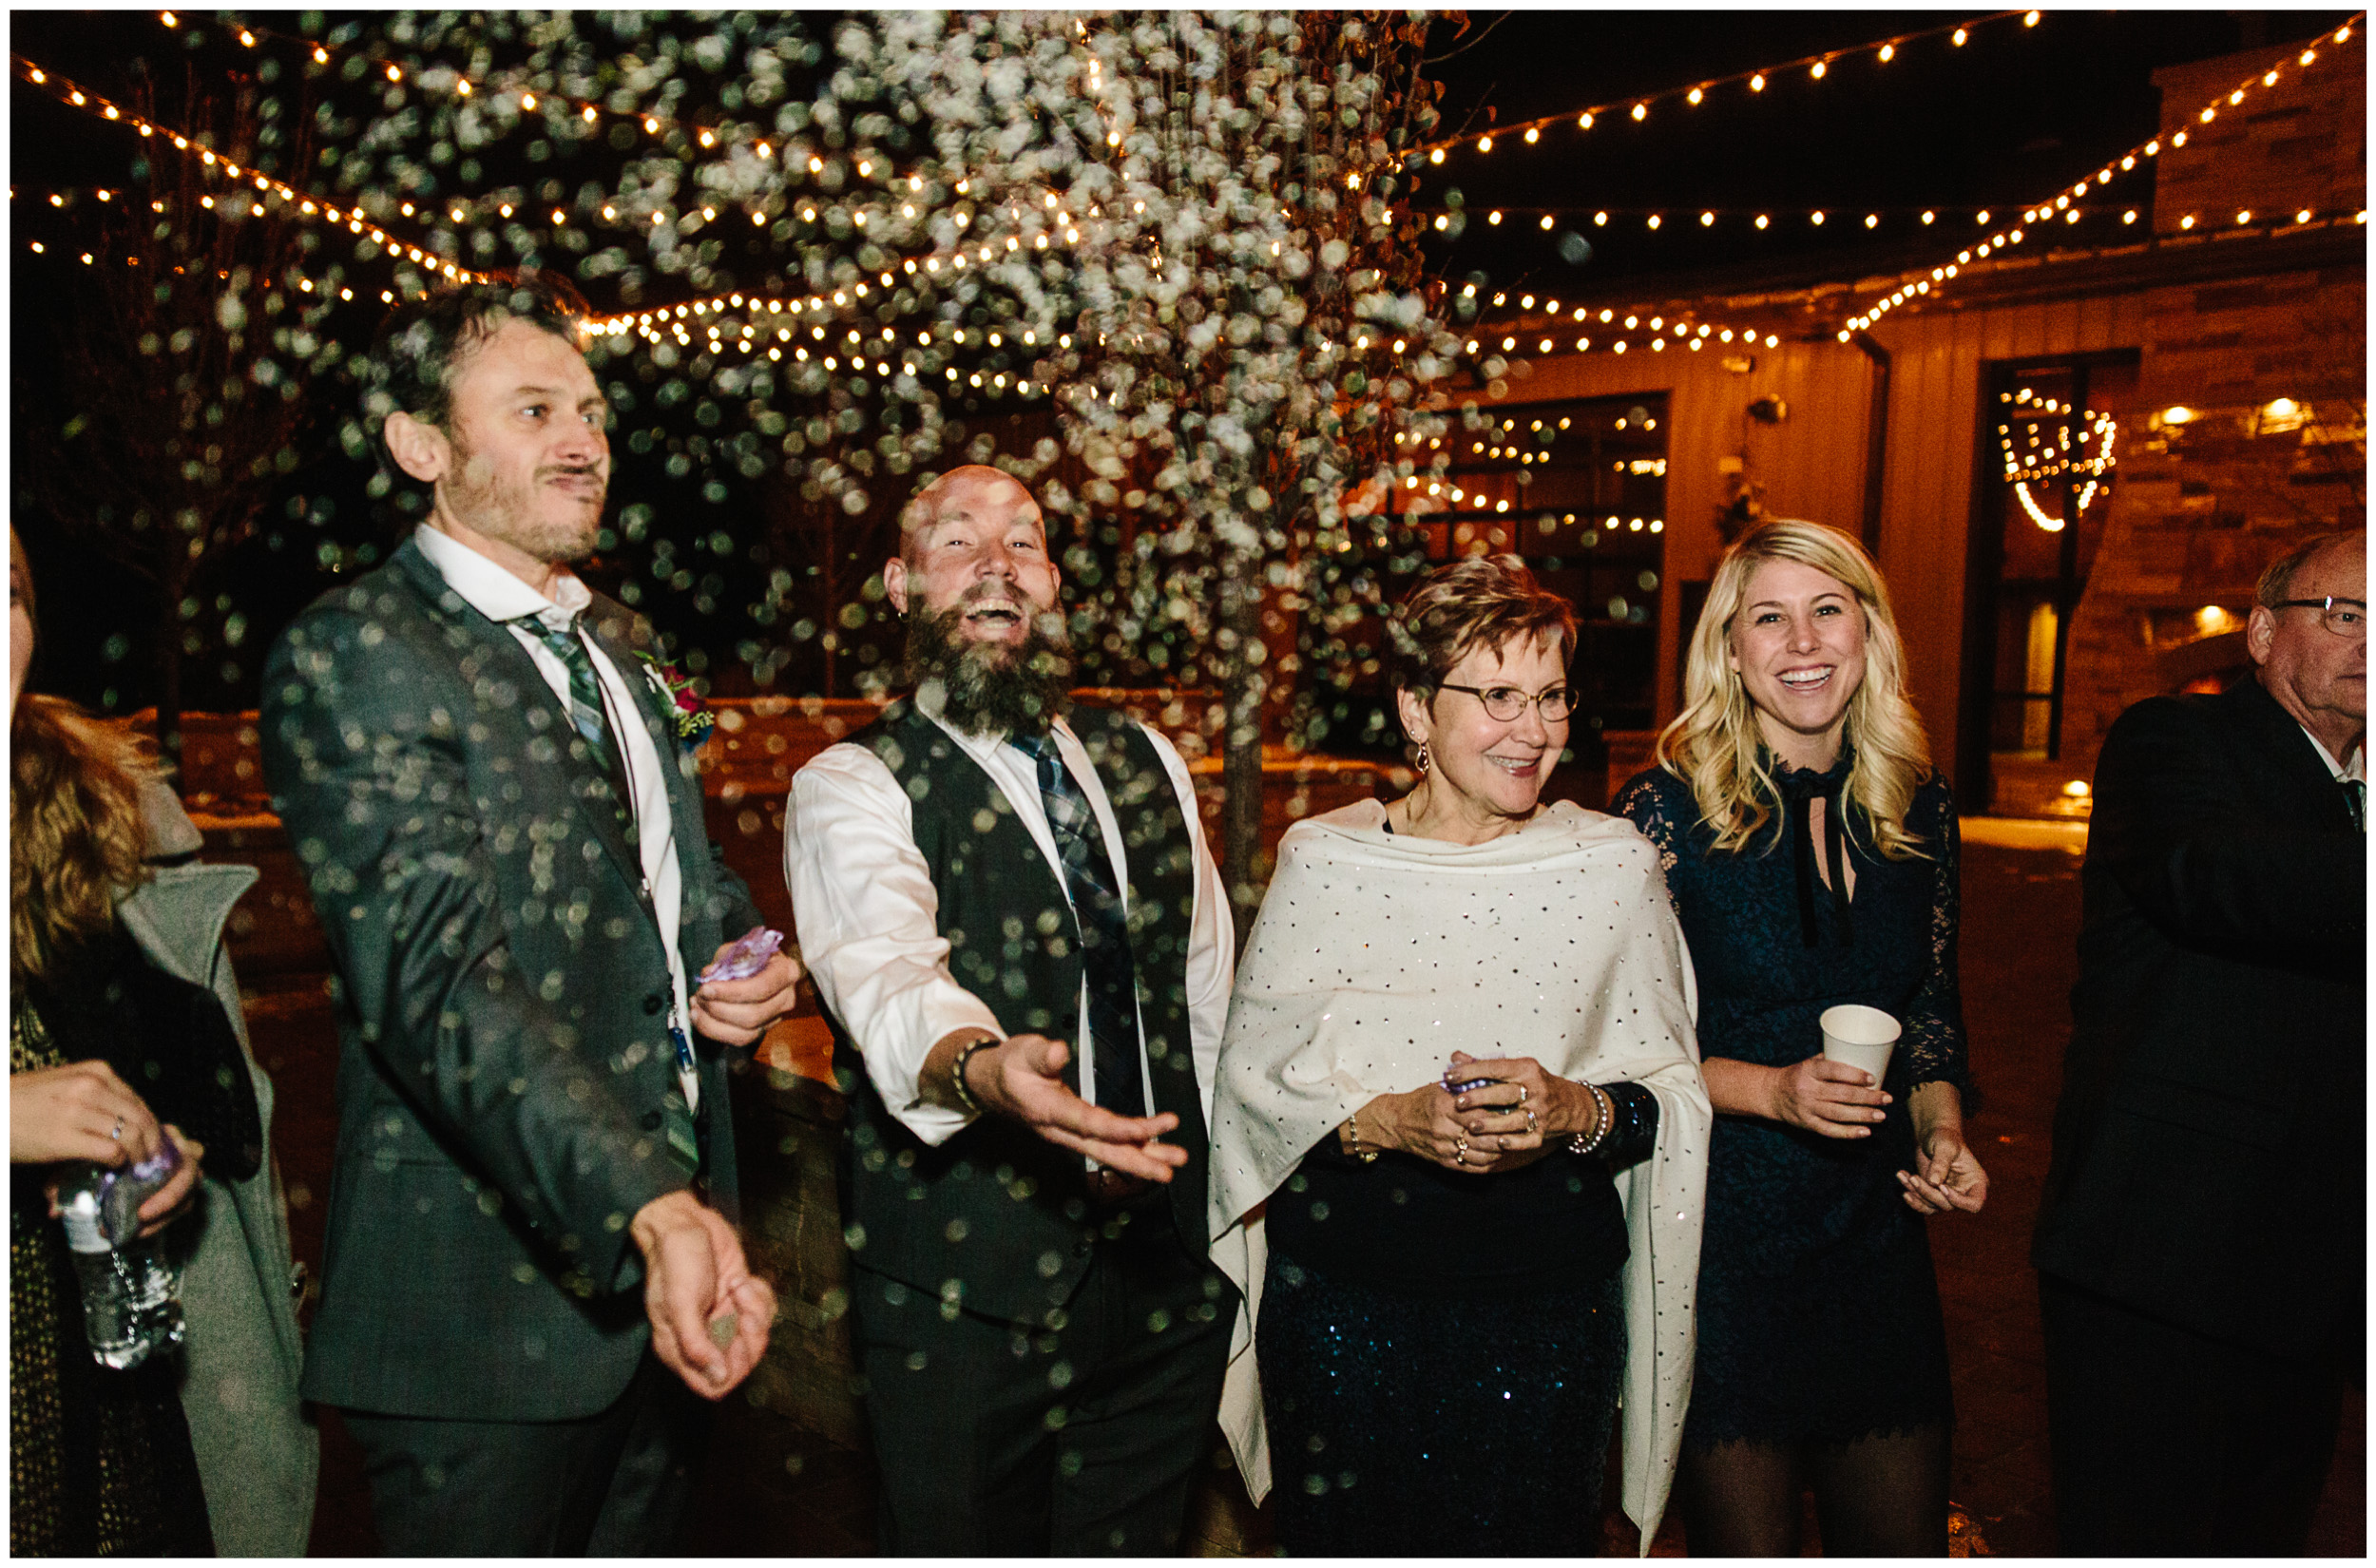 spruce_mountain_ranch_wedding_update3.jpg